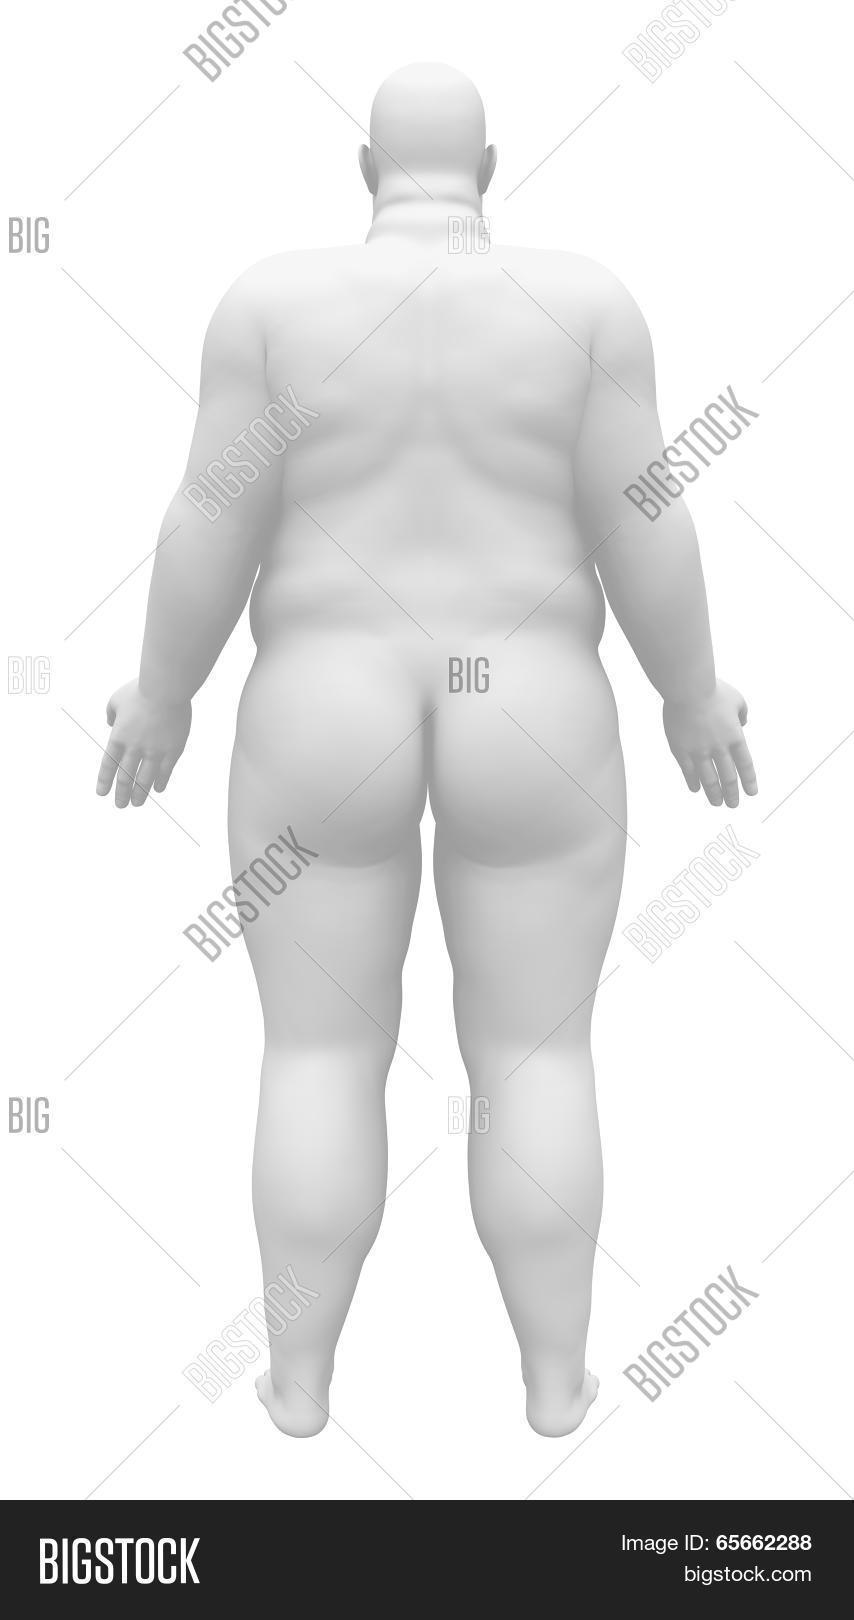 Obese Anatomy Male Figure - Back Image & Photo   Bigstock